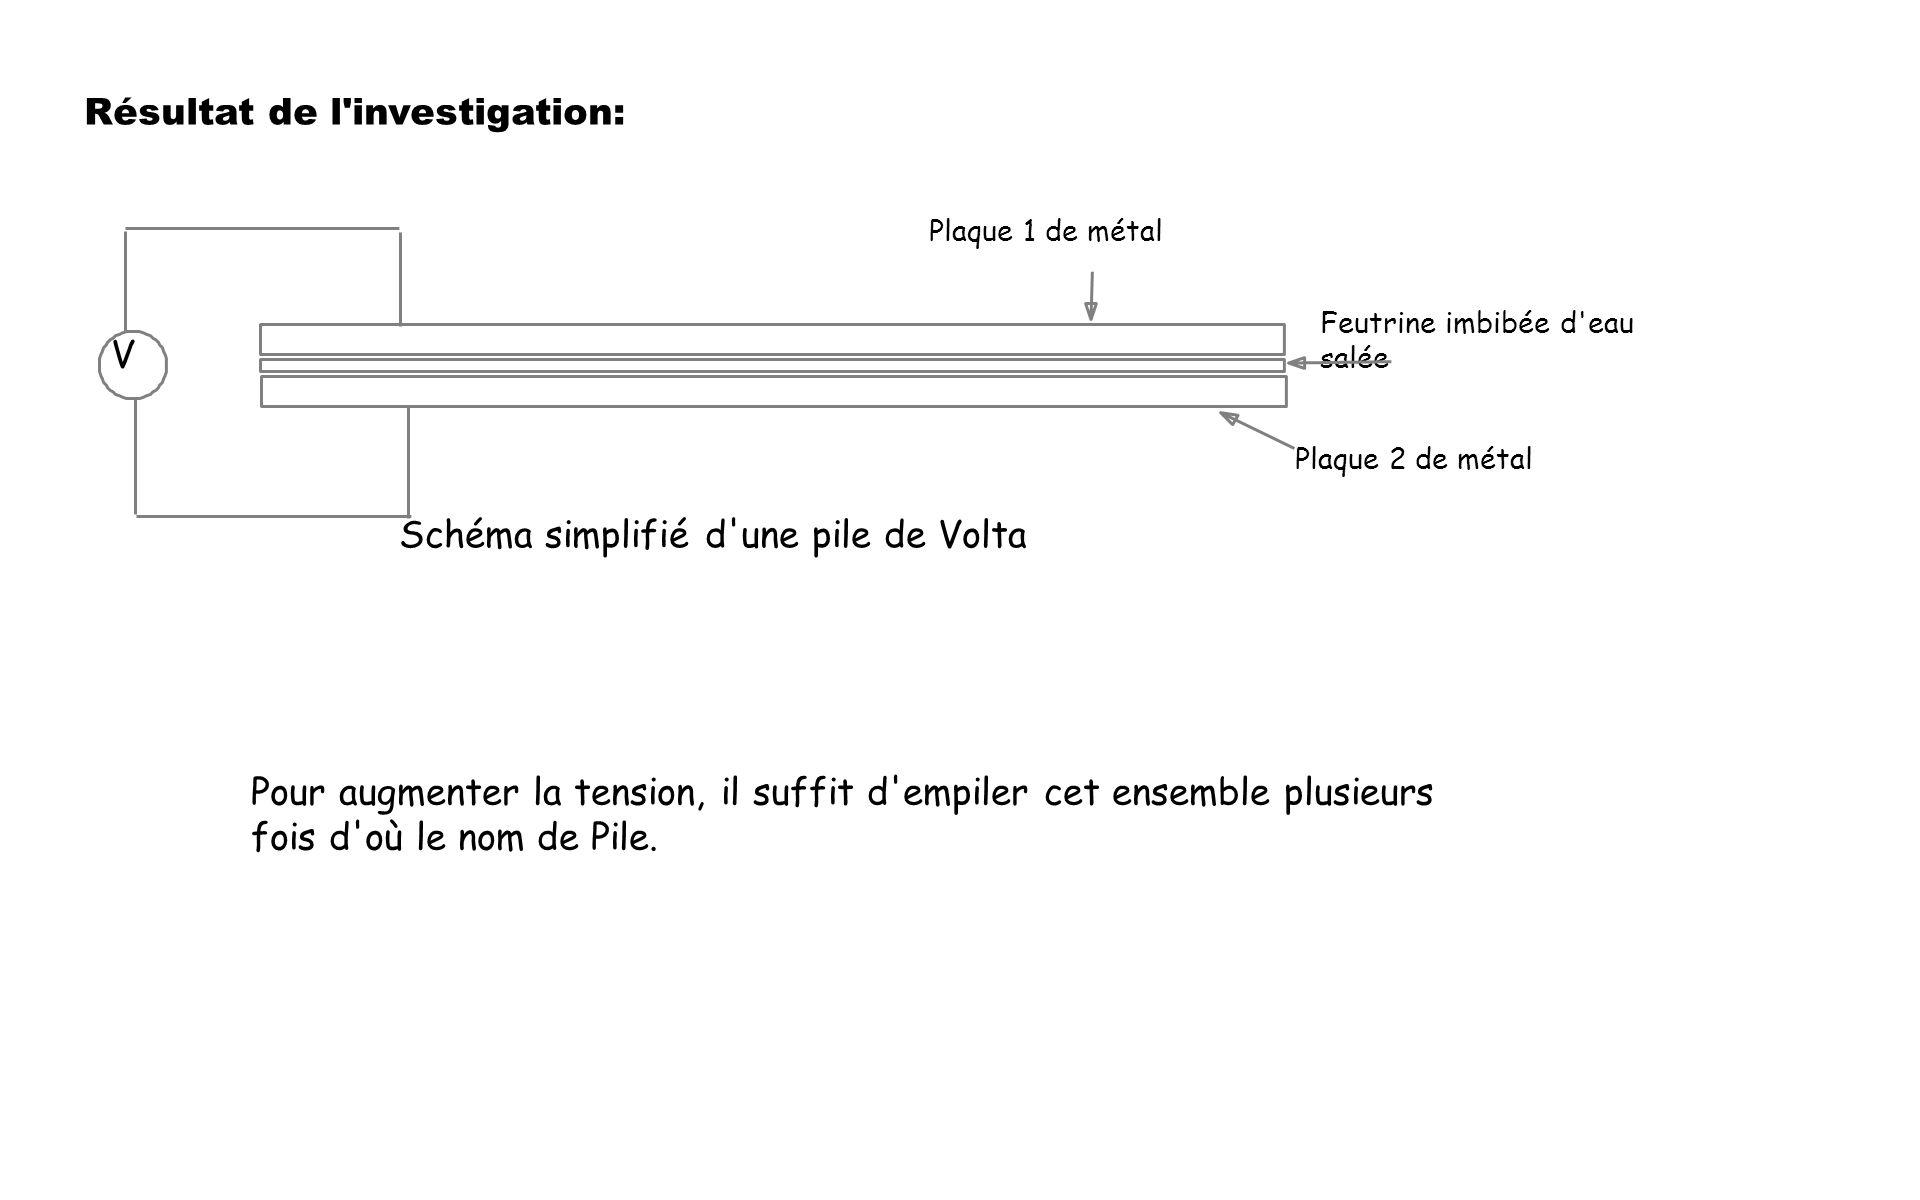 Résultat de l investigation: